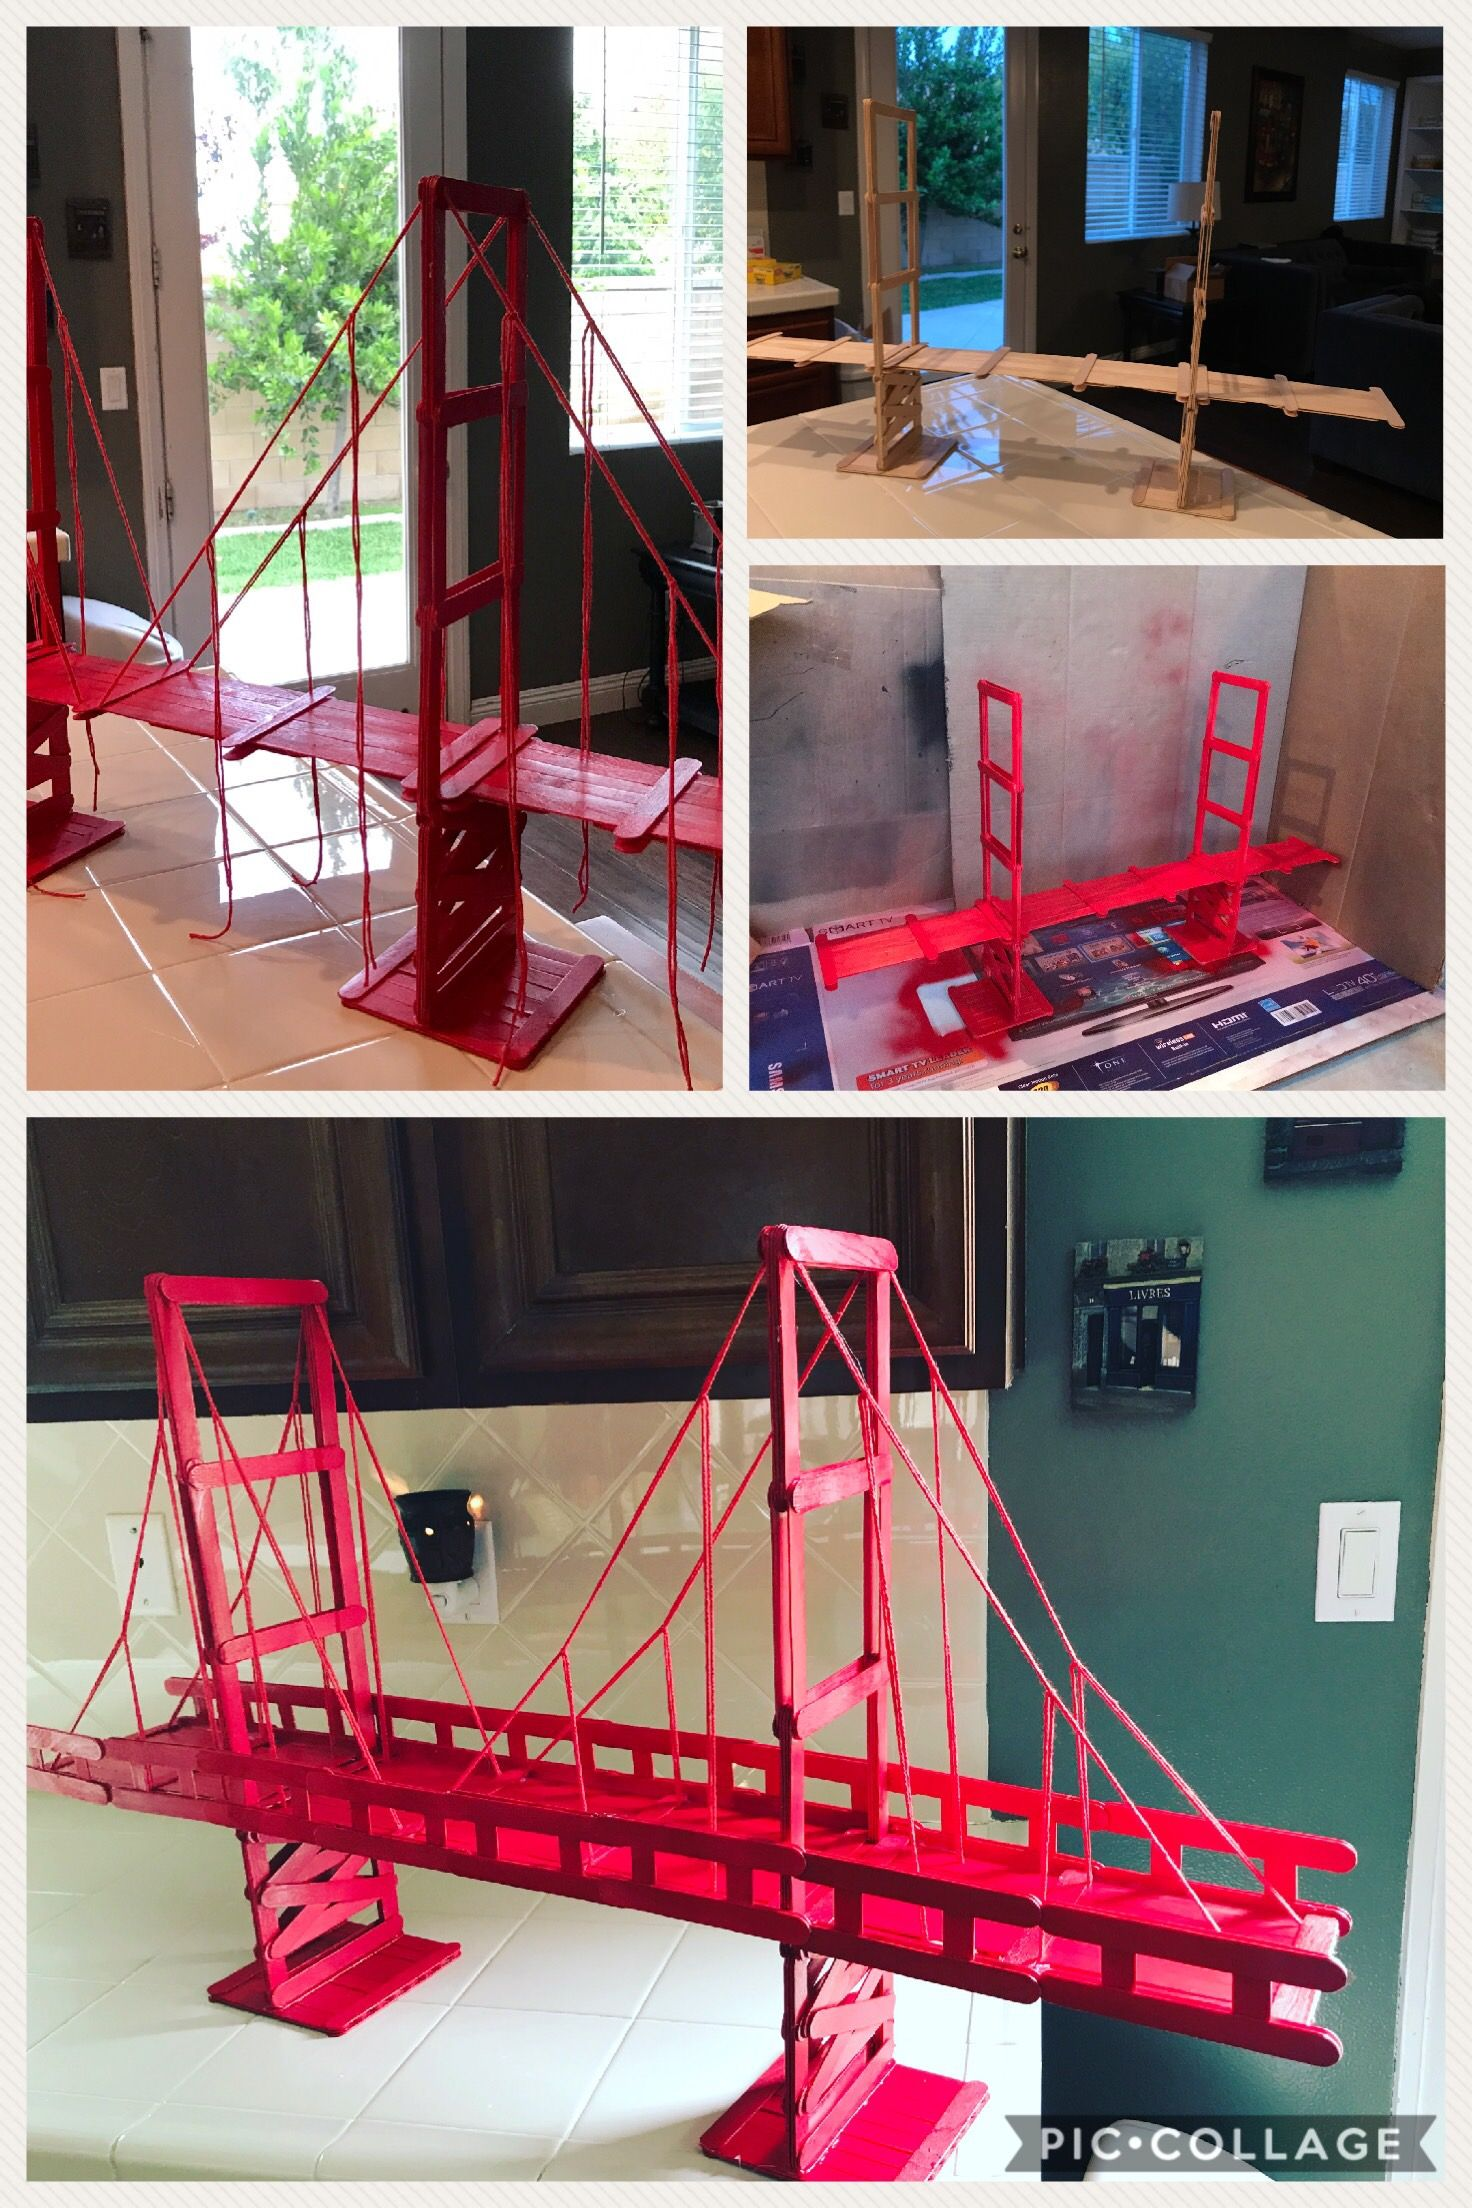 Golden Gate Bridge Project Materials Needed 400 Popsicle Sticks Hot Glue Gun Extra 30 Red Spray Paint String